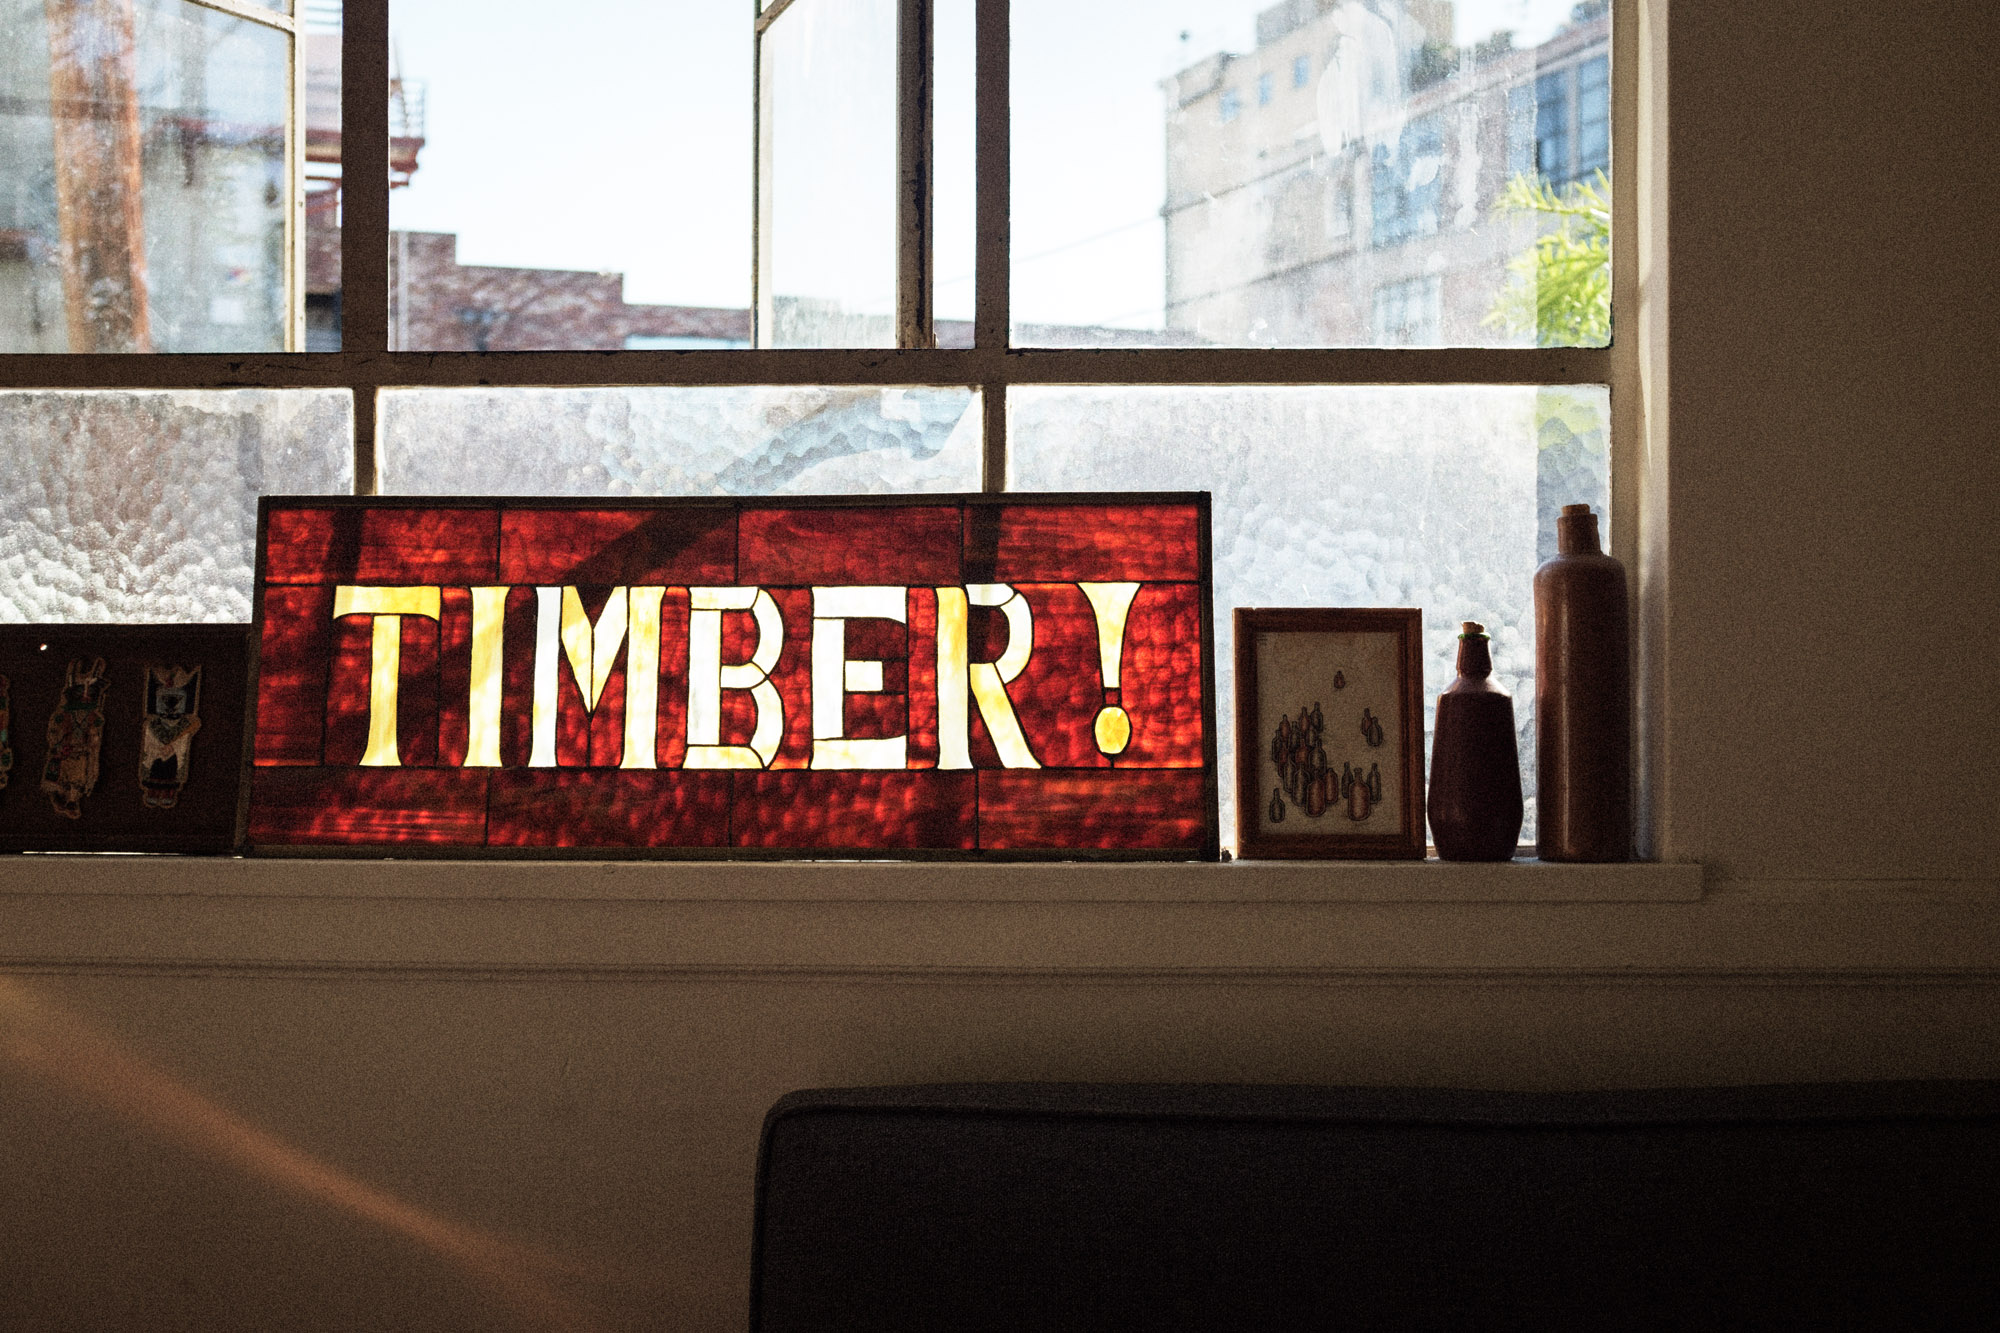 150125_s-p_timber_0008.jpg